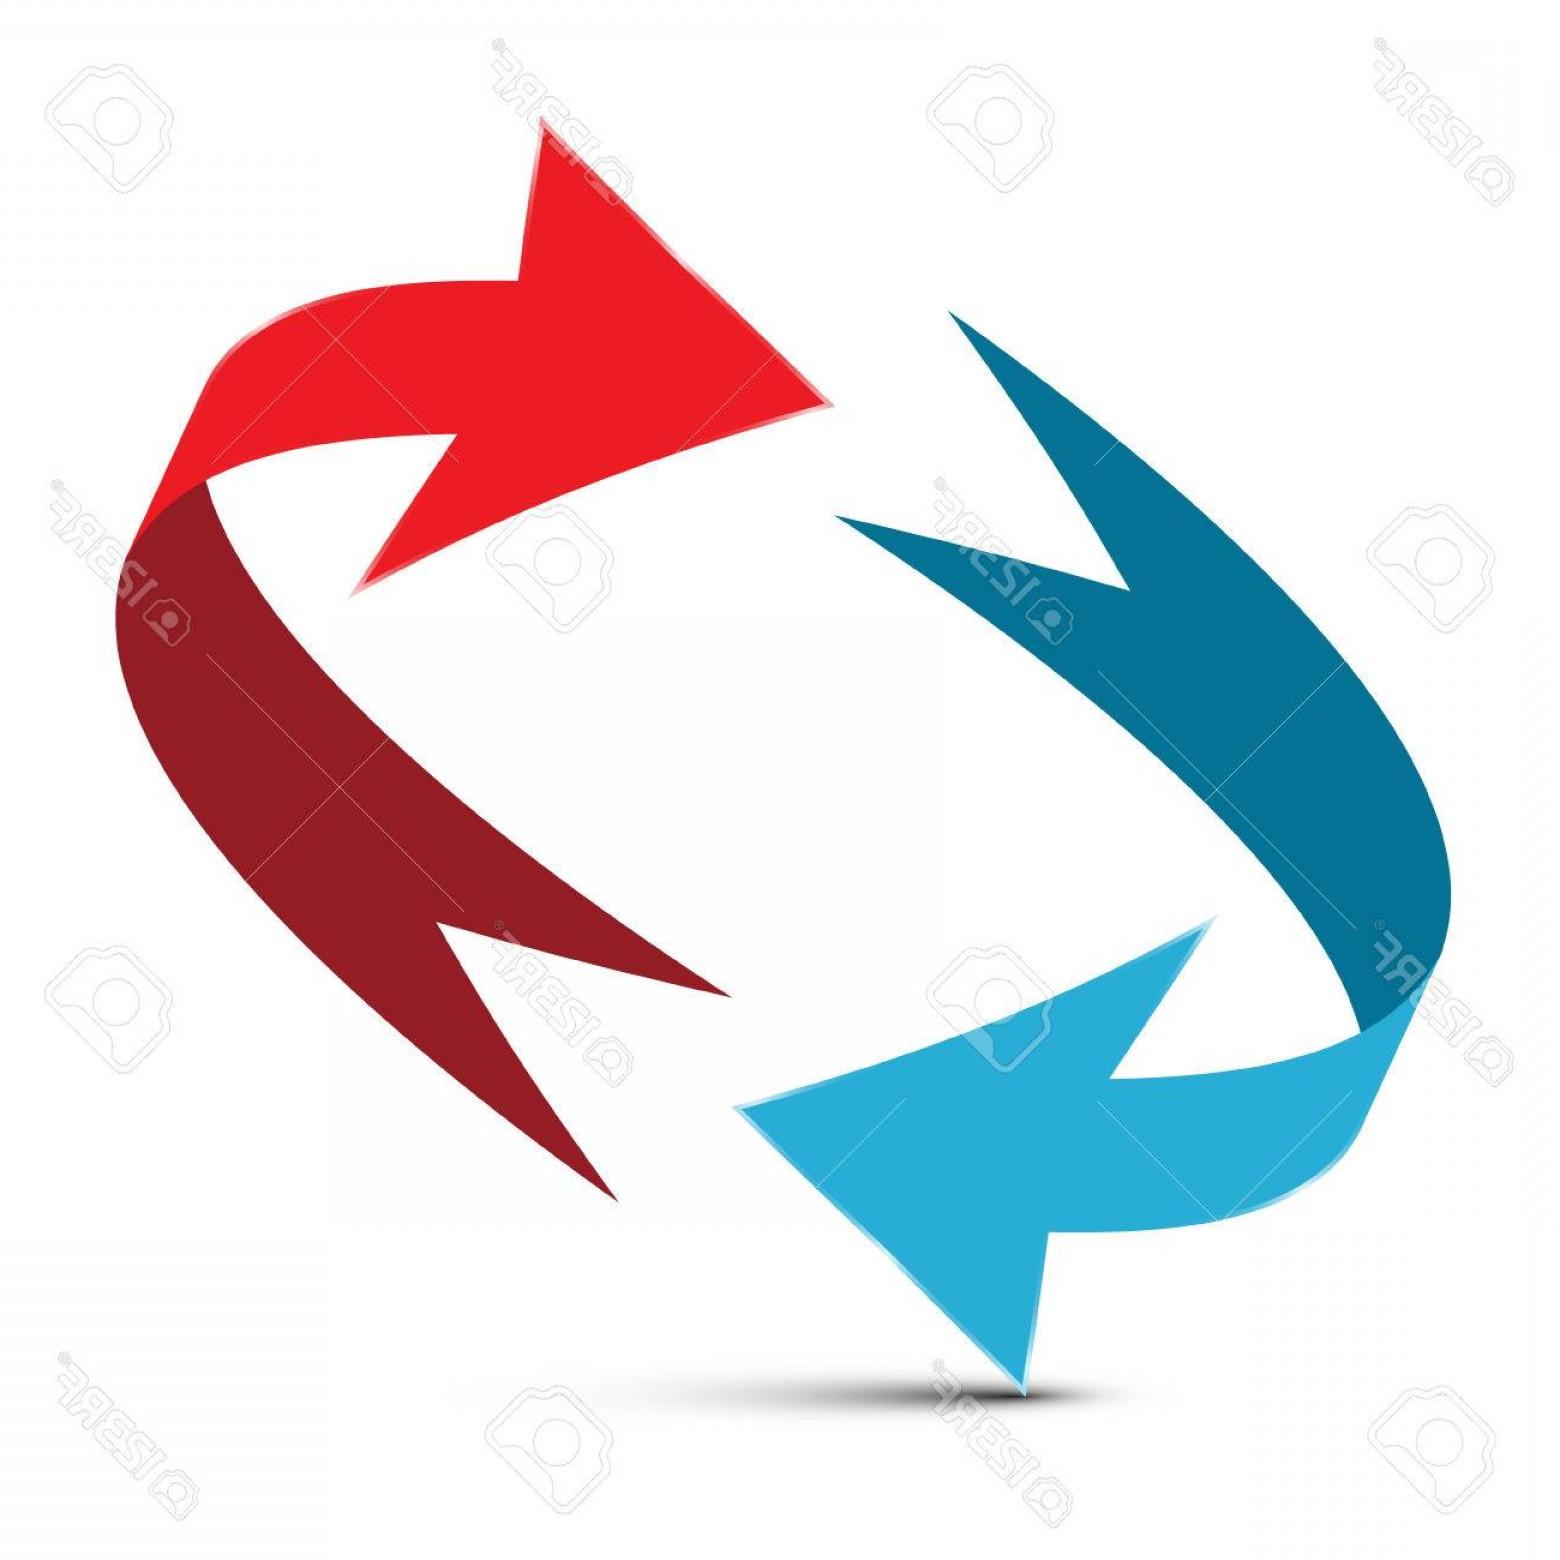 1560x1560 Photostock Vector Arrows Illustration Red And Blue Double Arrow